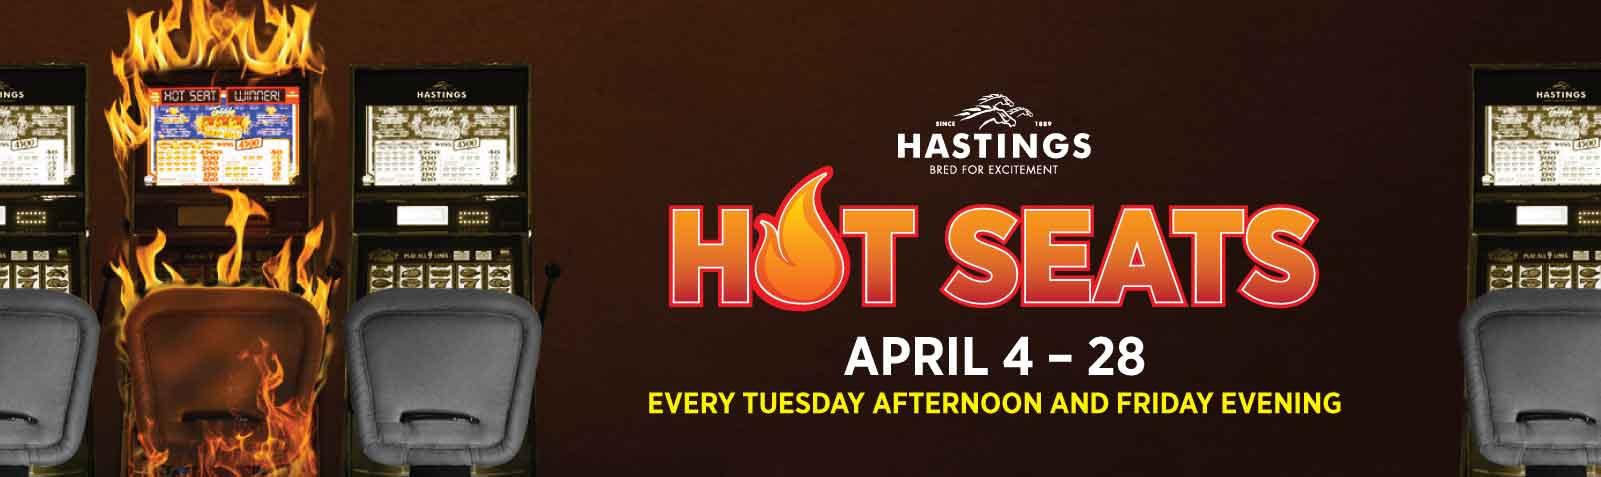 MKT17-089-Hastings-Hot-Seats-Friday-April-Slider